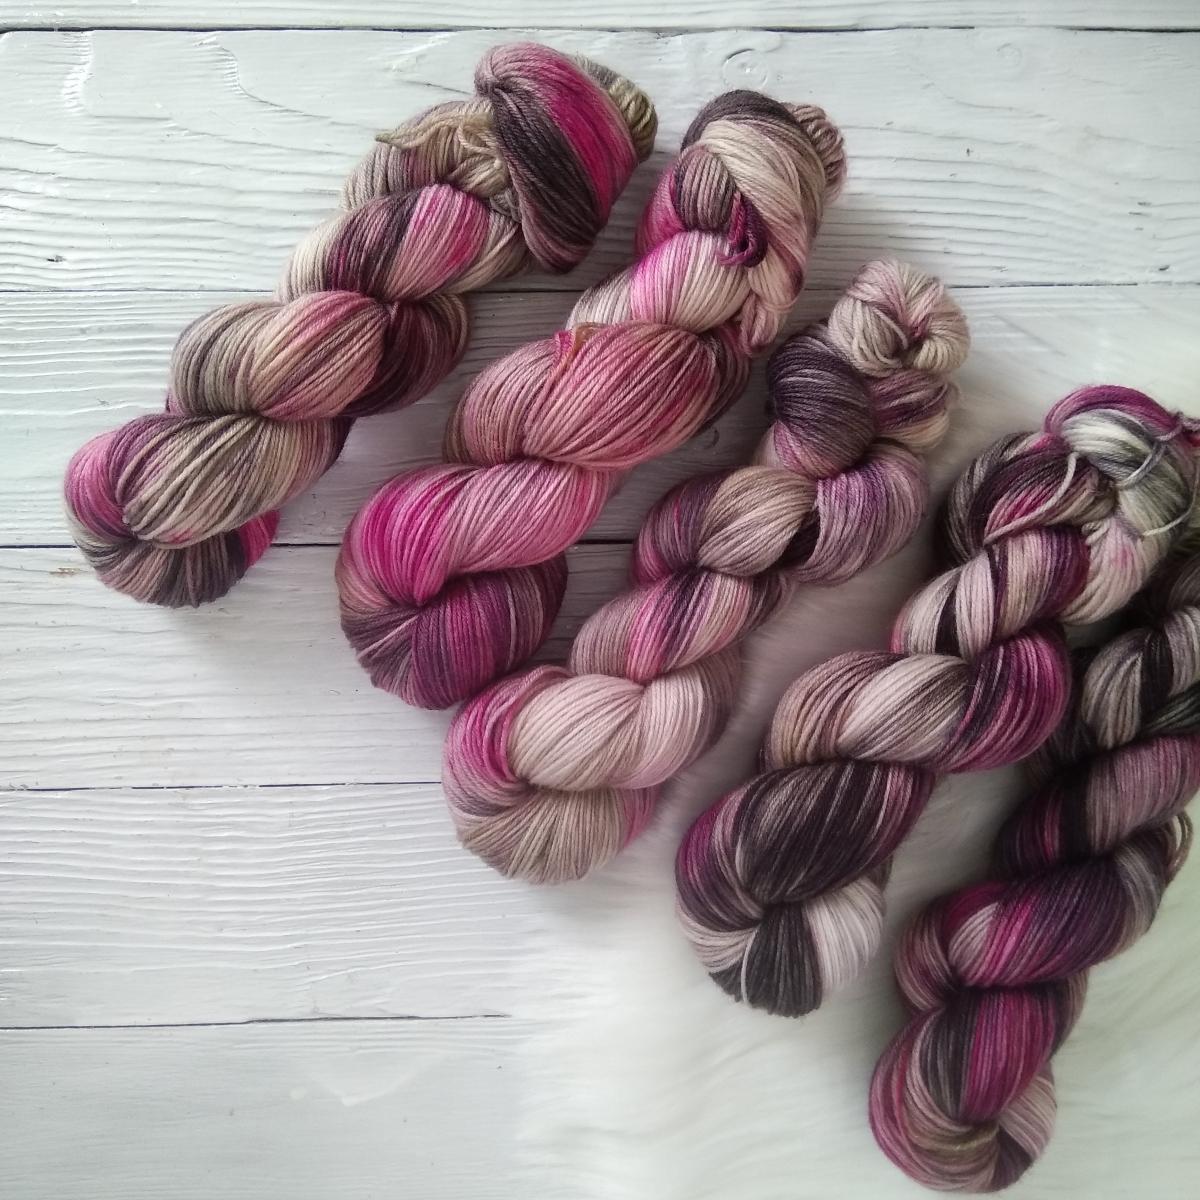 woodico.pro hand dyed yarn 037 4 1200x1200 - Hand dyed yarn / 037